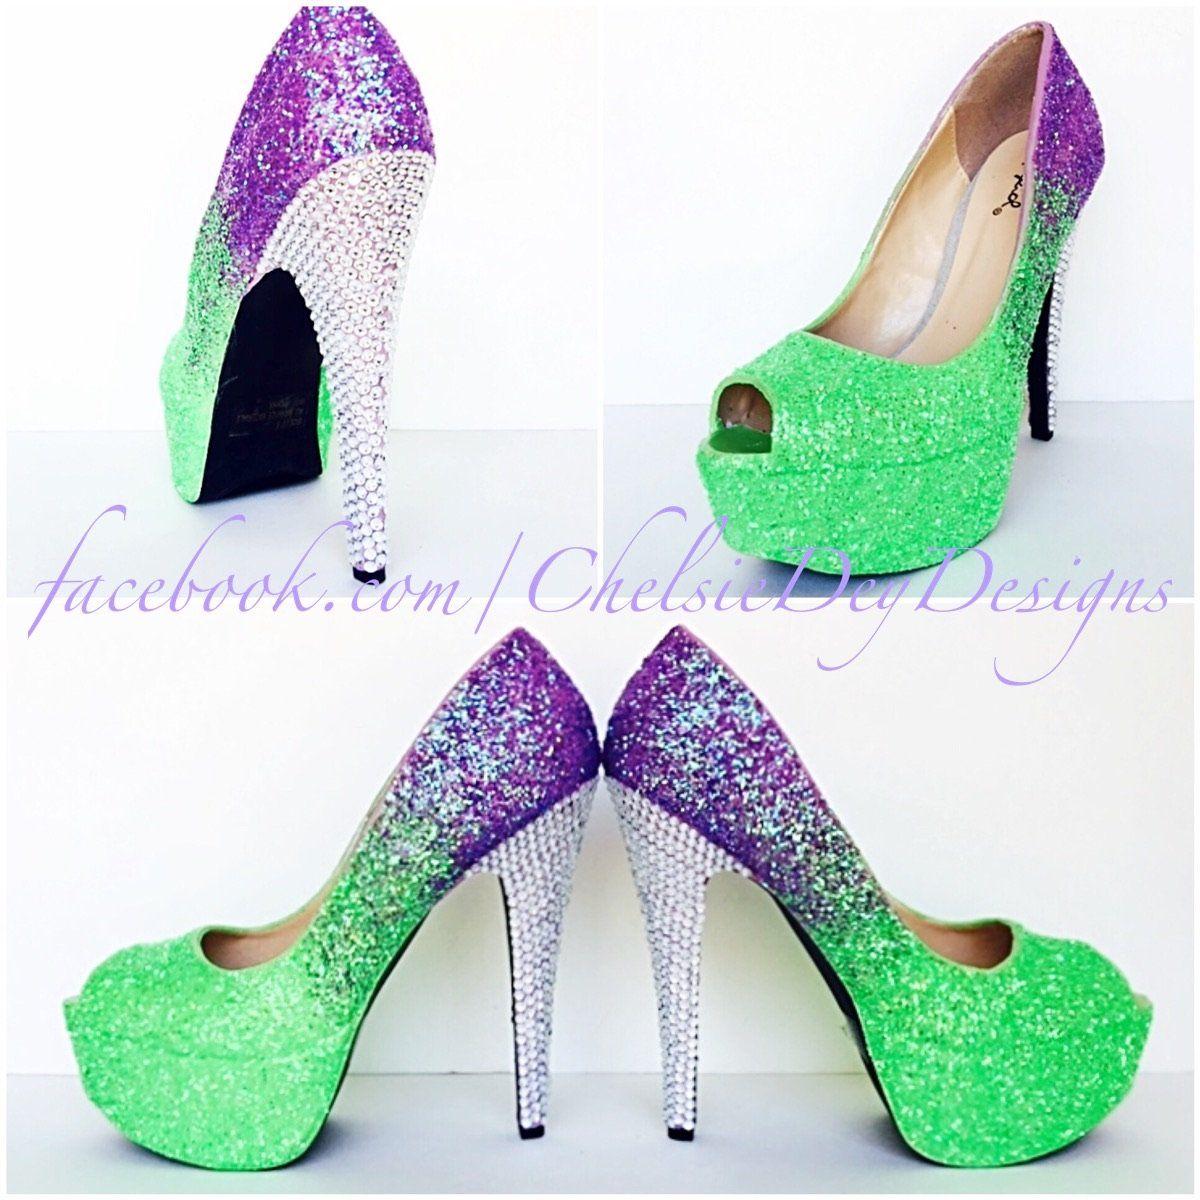 Lilac Peep Toe Glitter Pumps, Neon Green Violet Open Toe Heels, Lavender Ombre High Heels